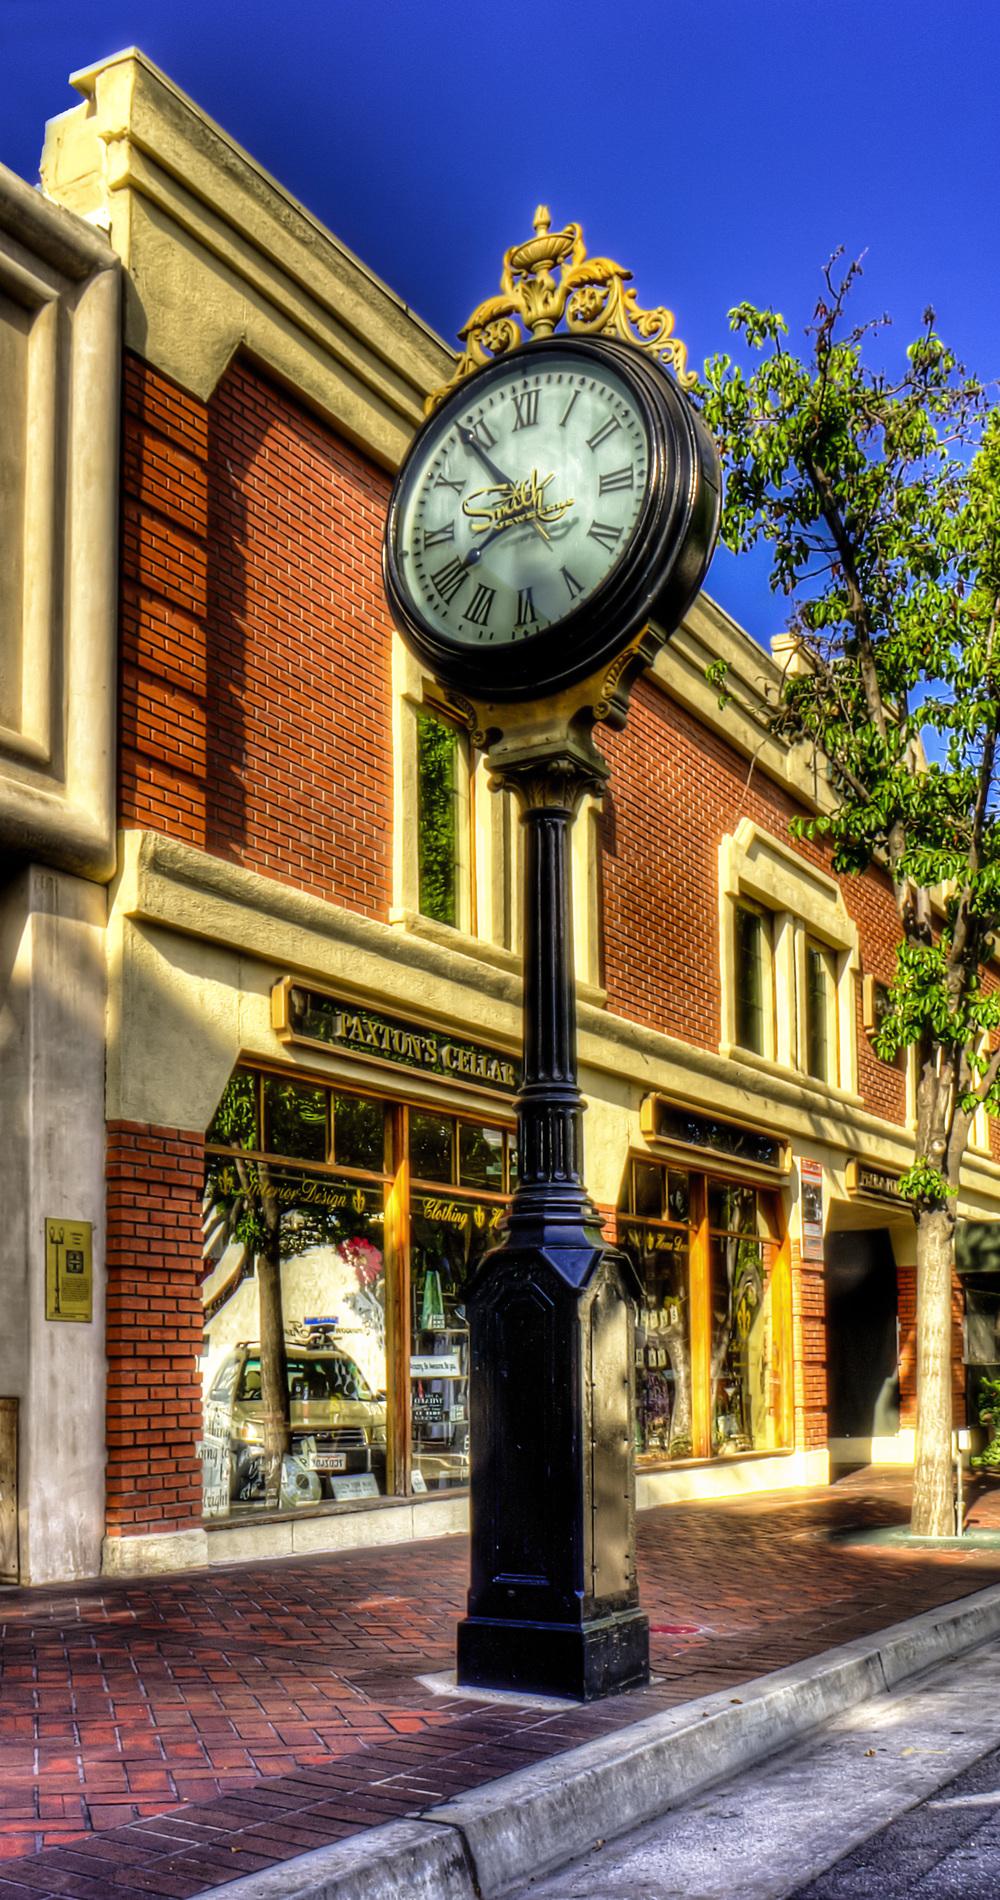 smith jeweler clock.jpg